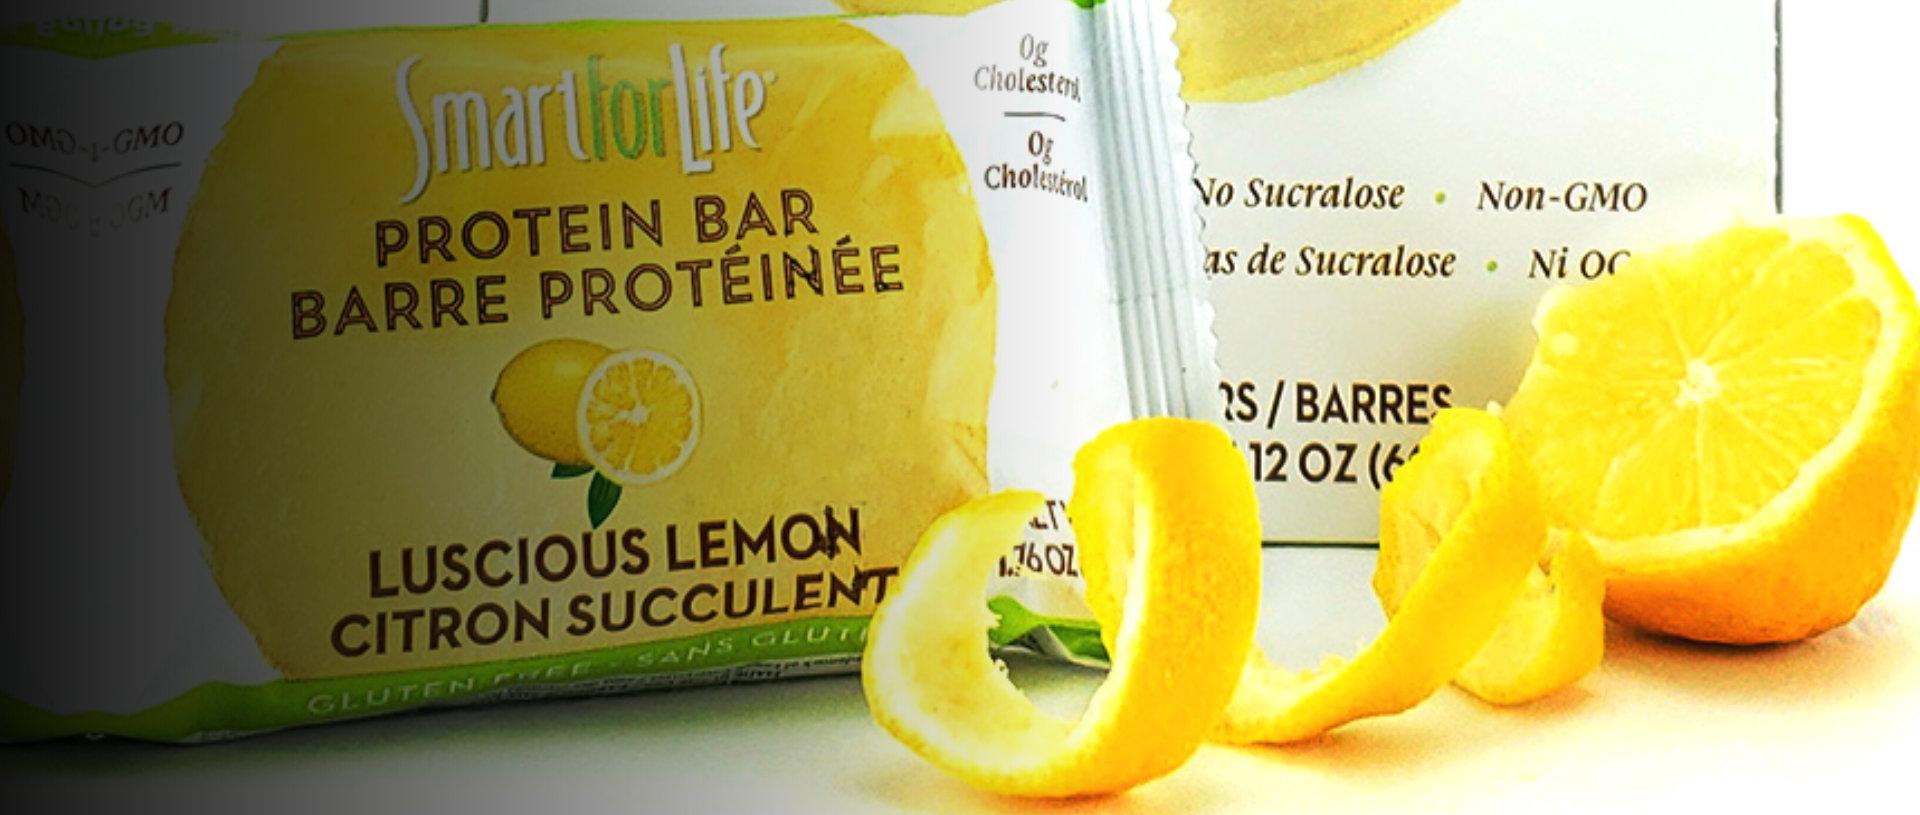 smart for life luscious lemon flavor